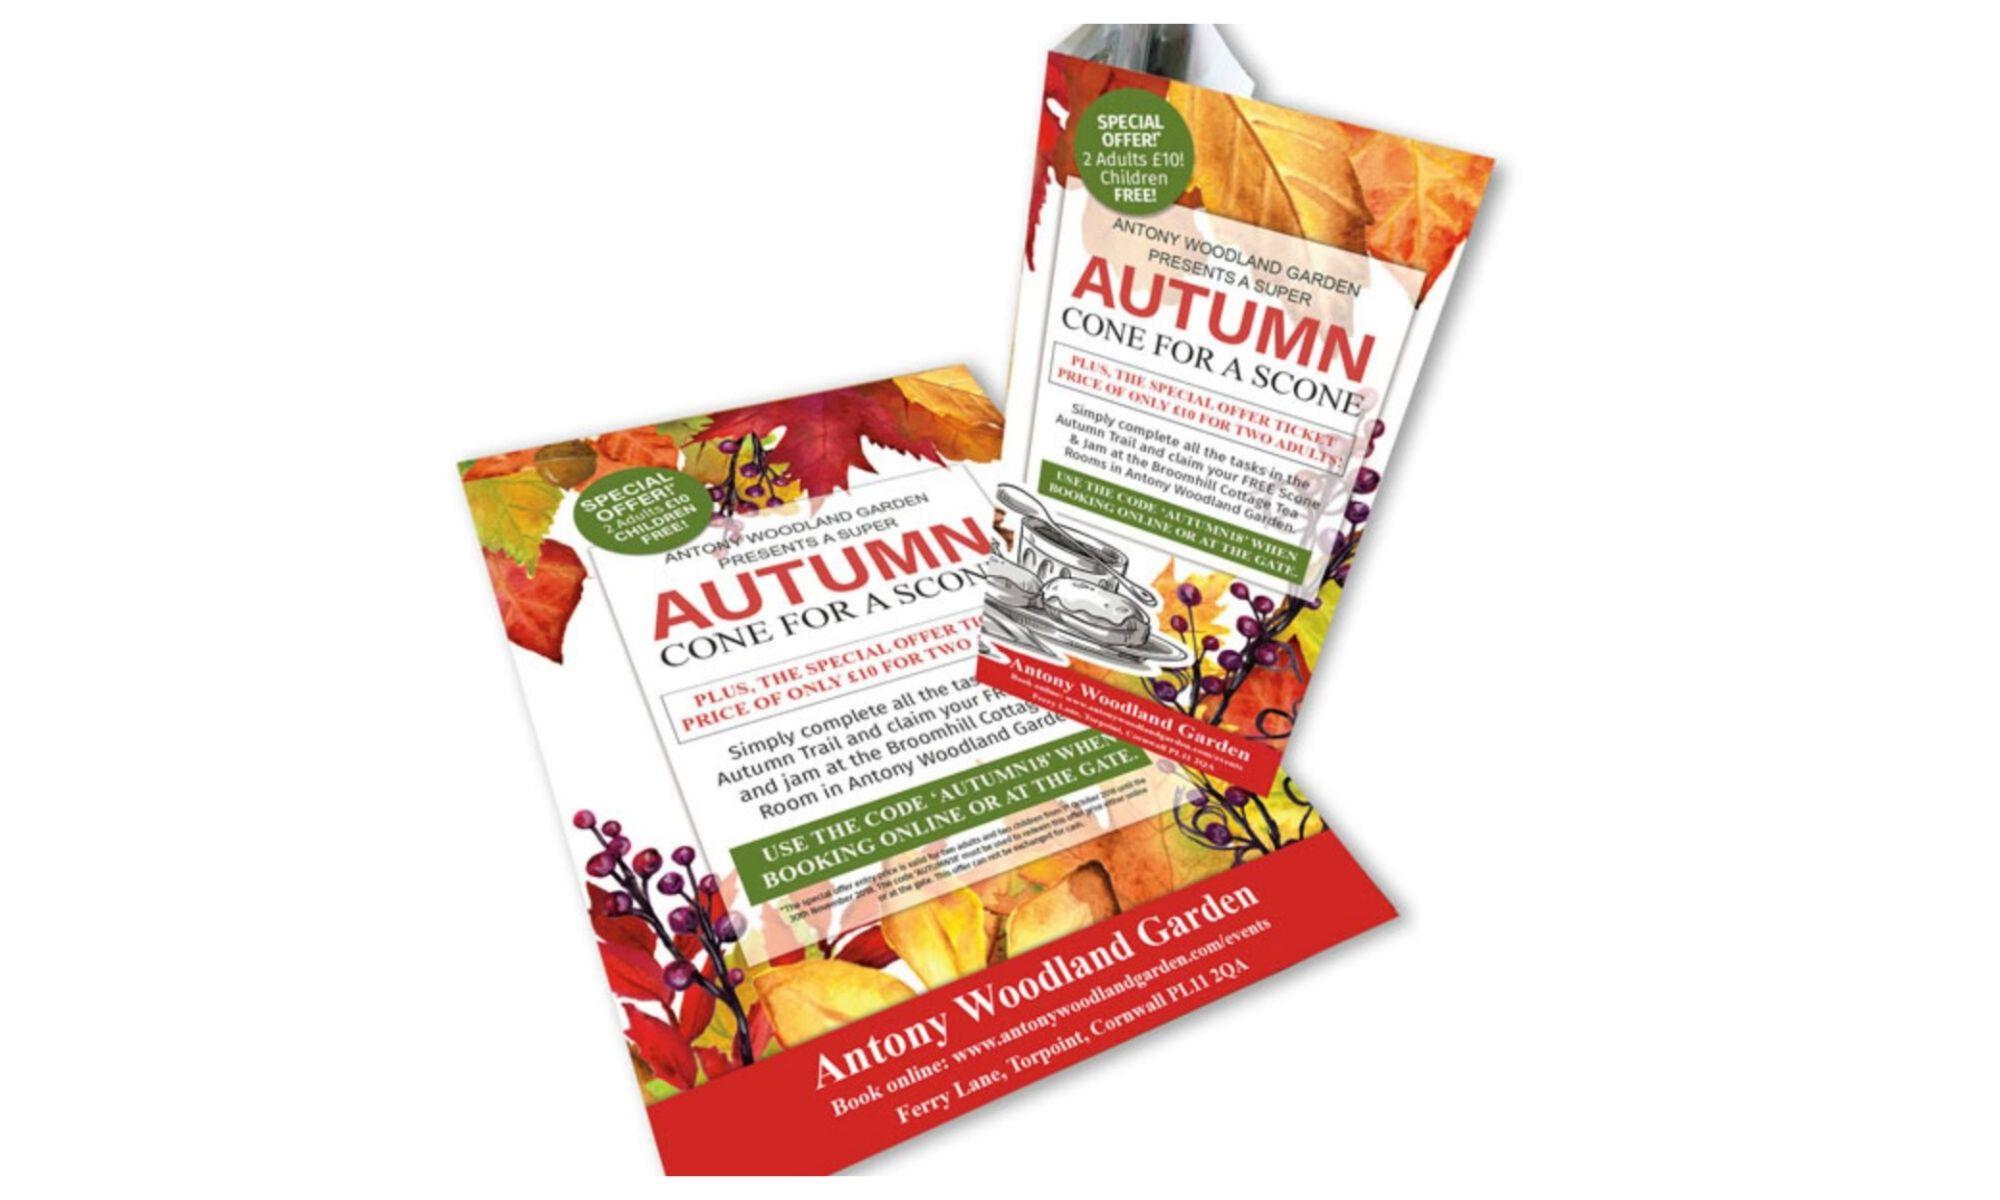 Antony Woodland Garden Autumn Leaflet